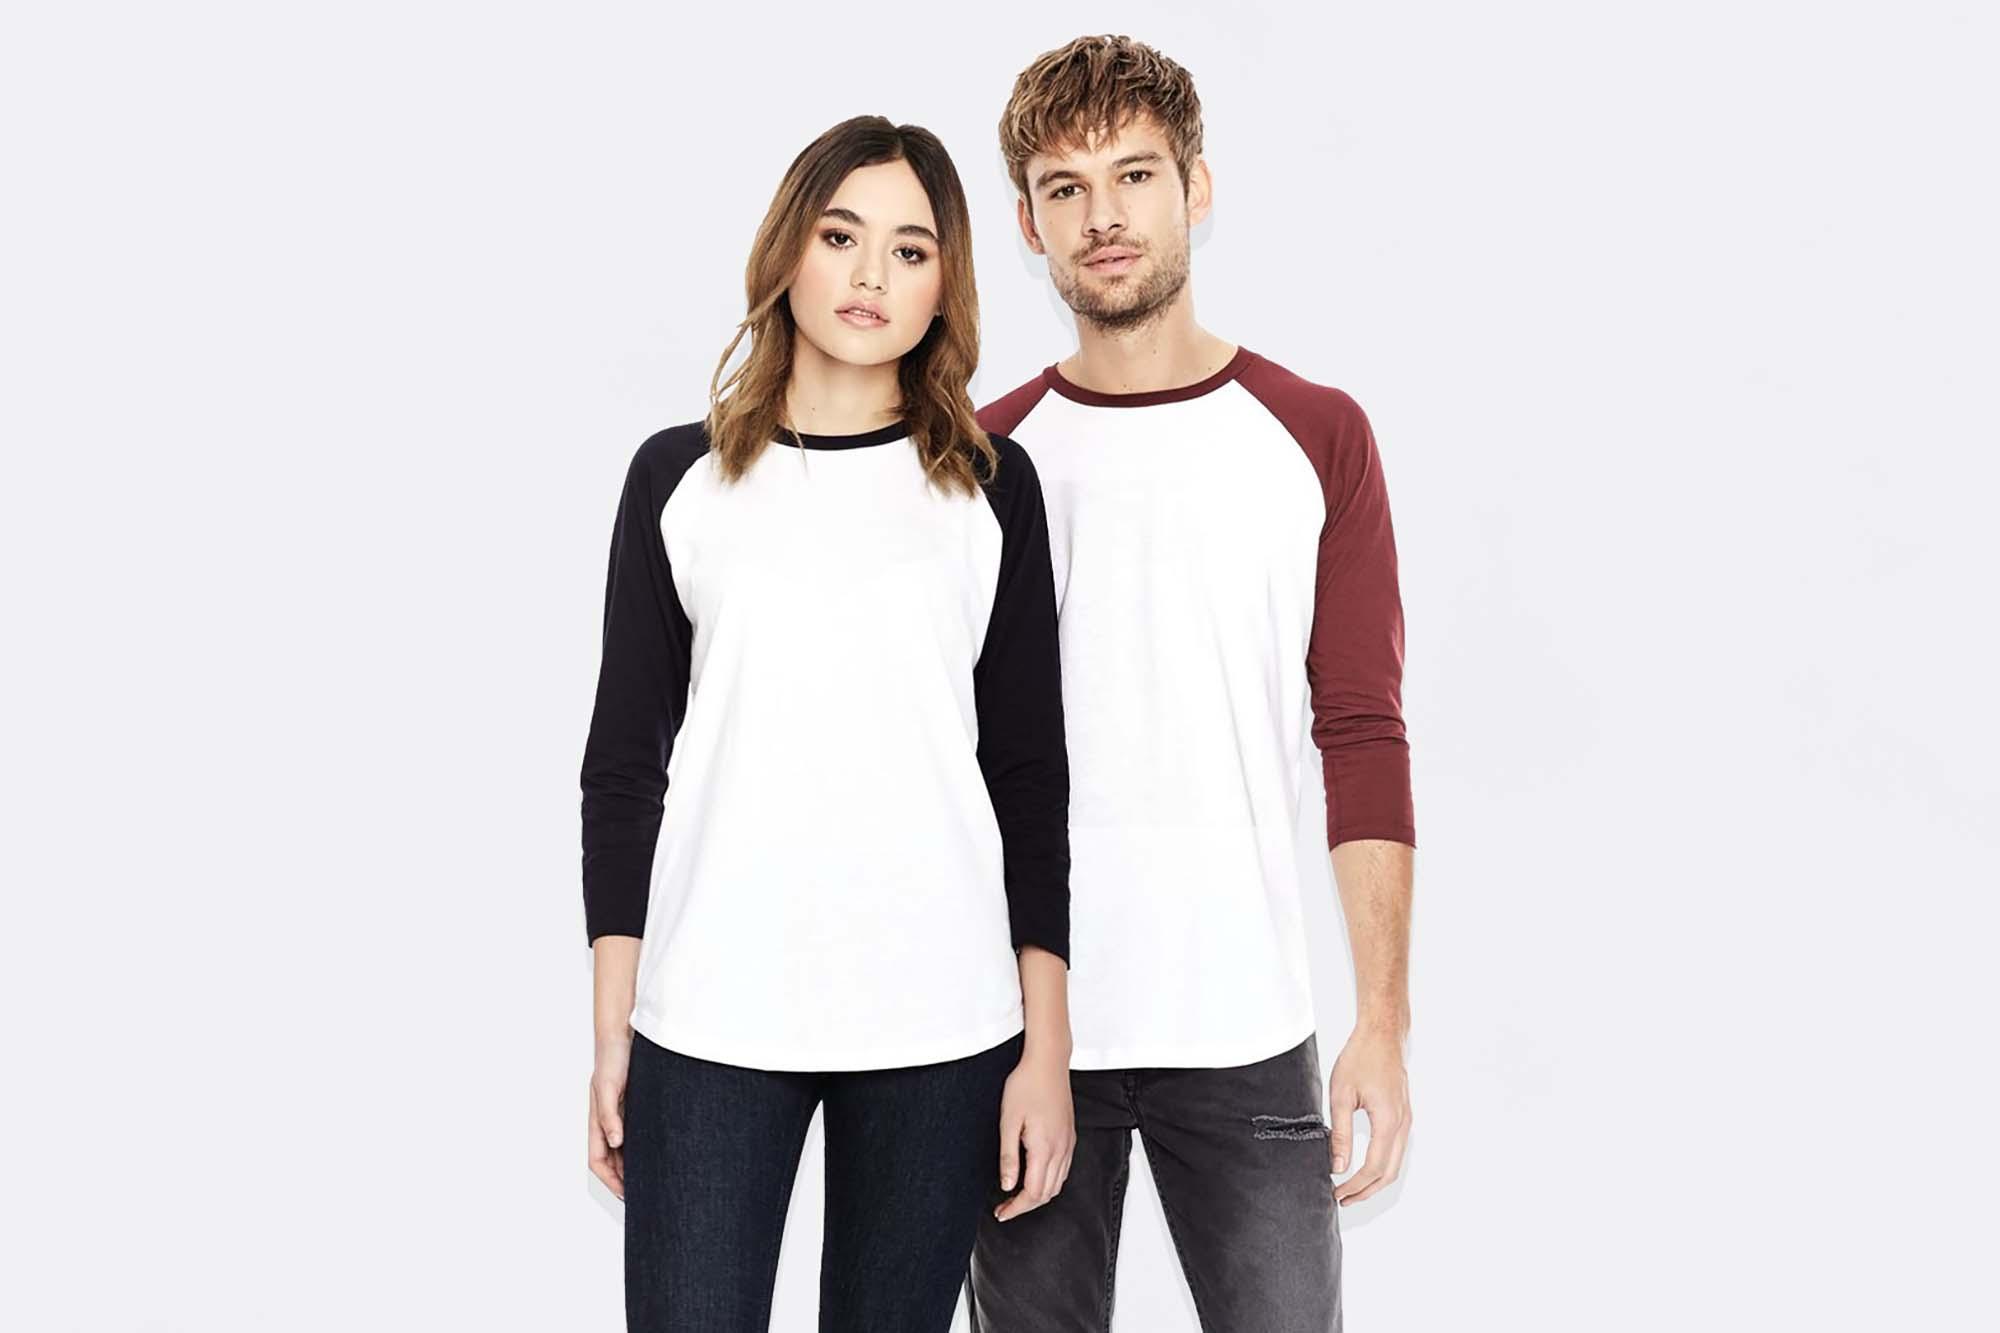 Male and Female Shirt Mockup 2